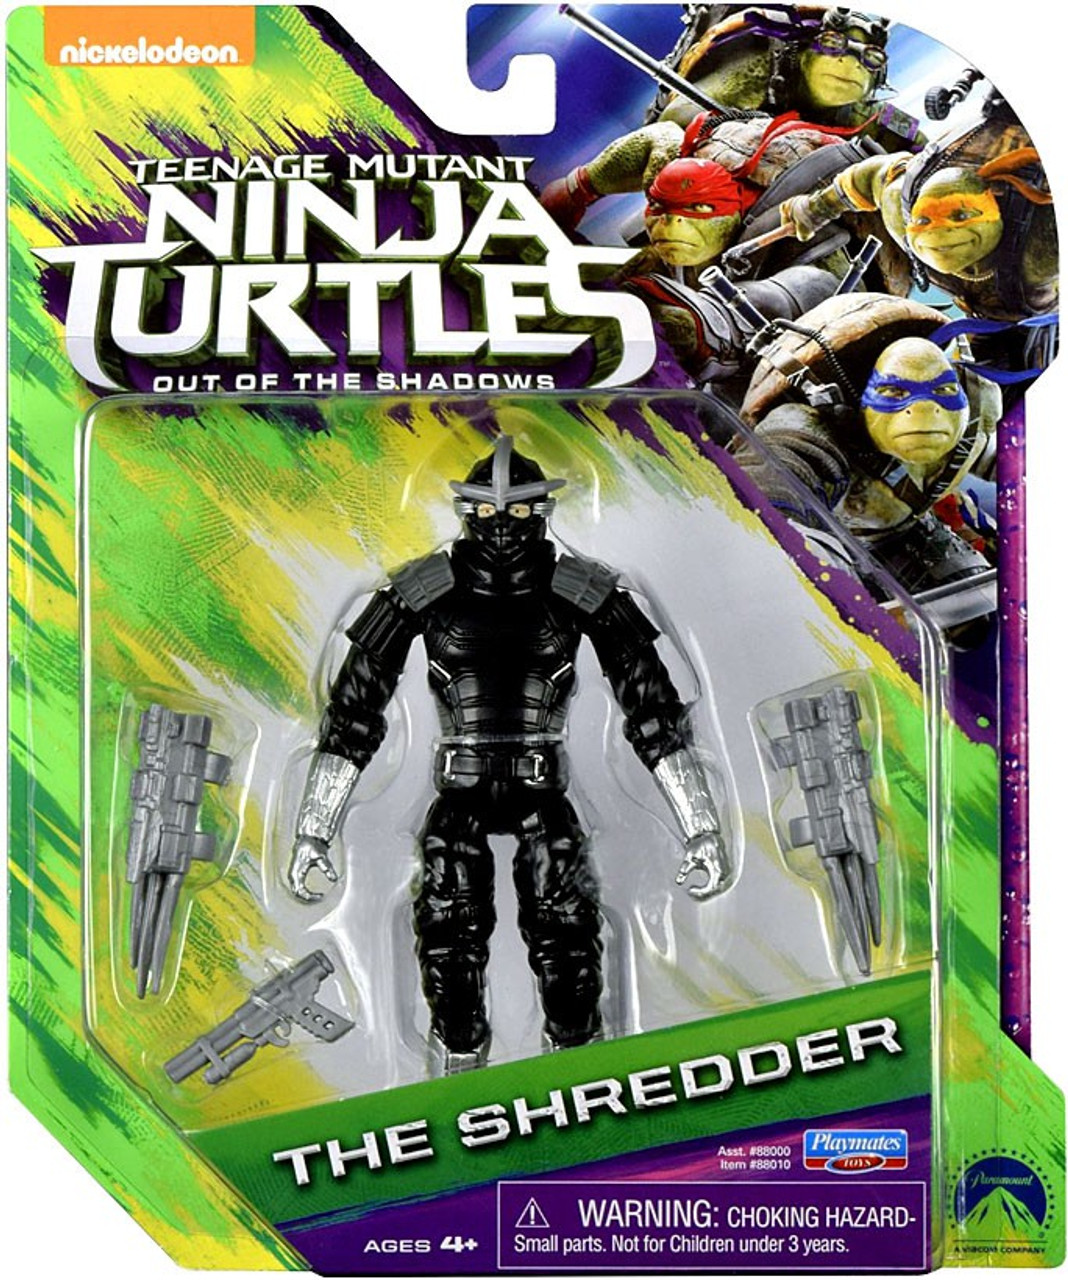 Teenage Mutant Ninja Turtles Out Of The Shadows The Shredder